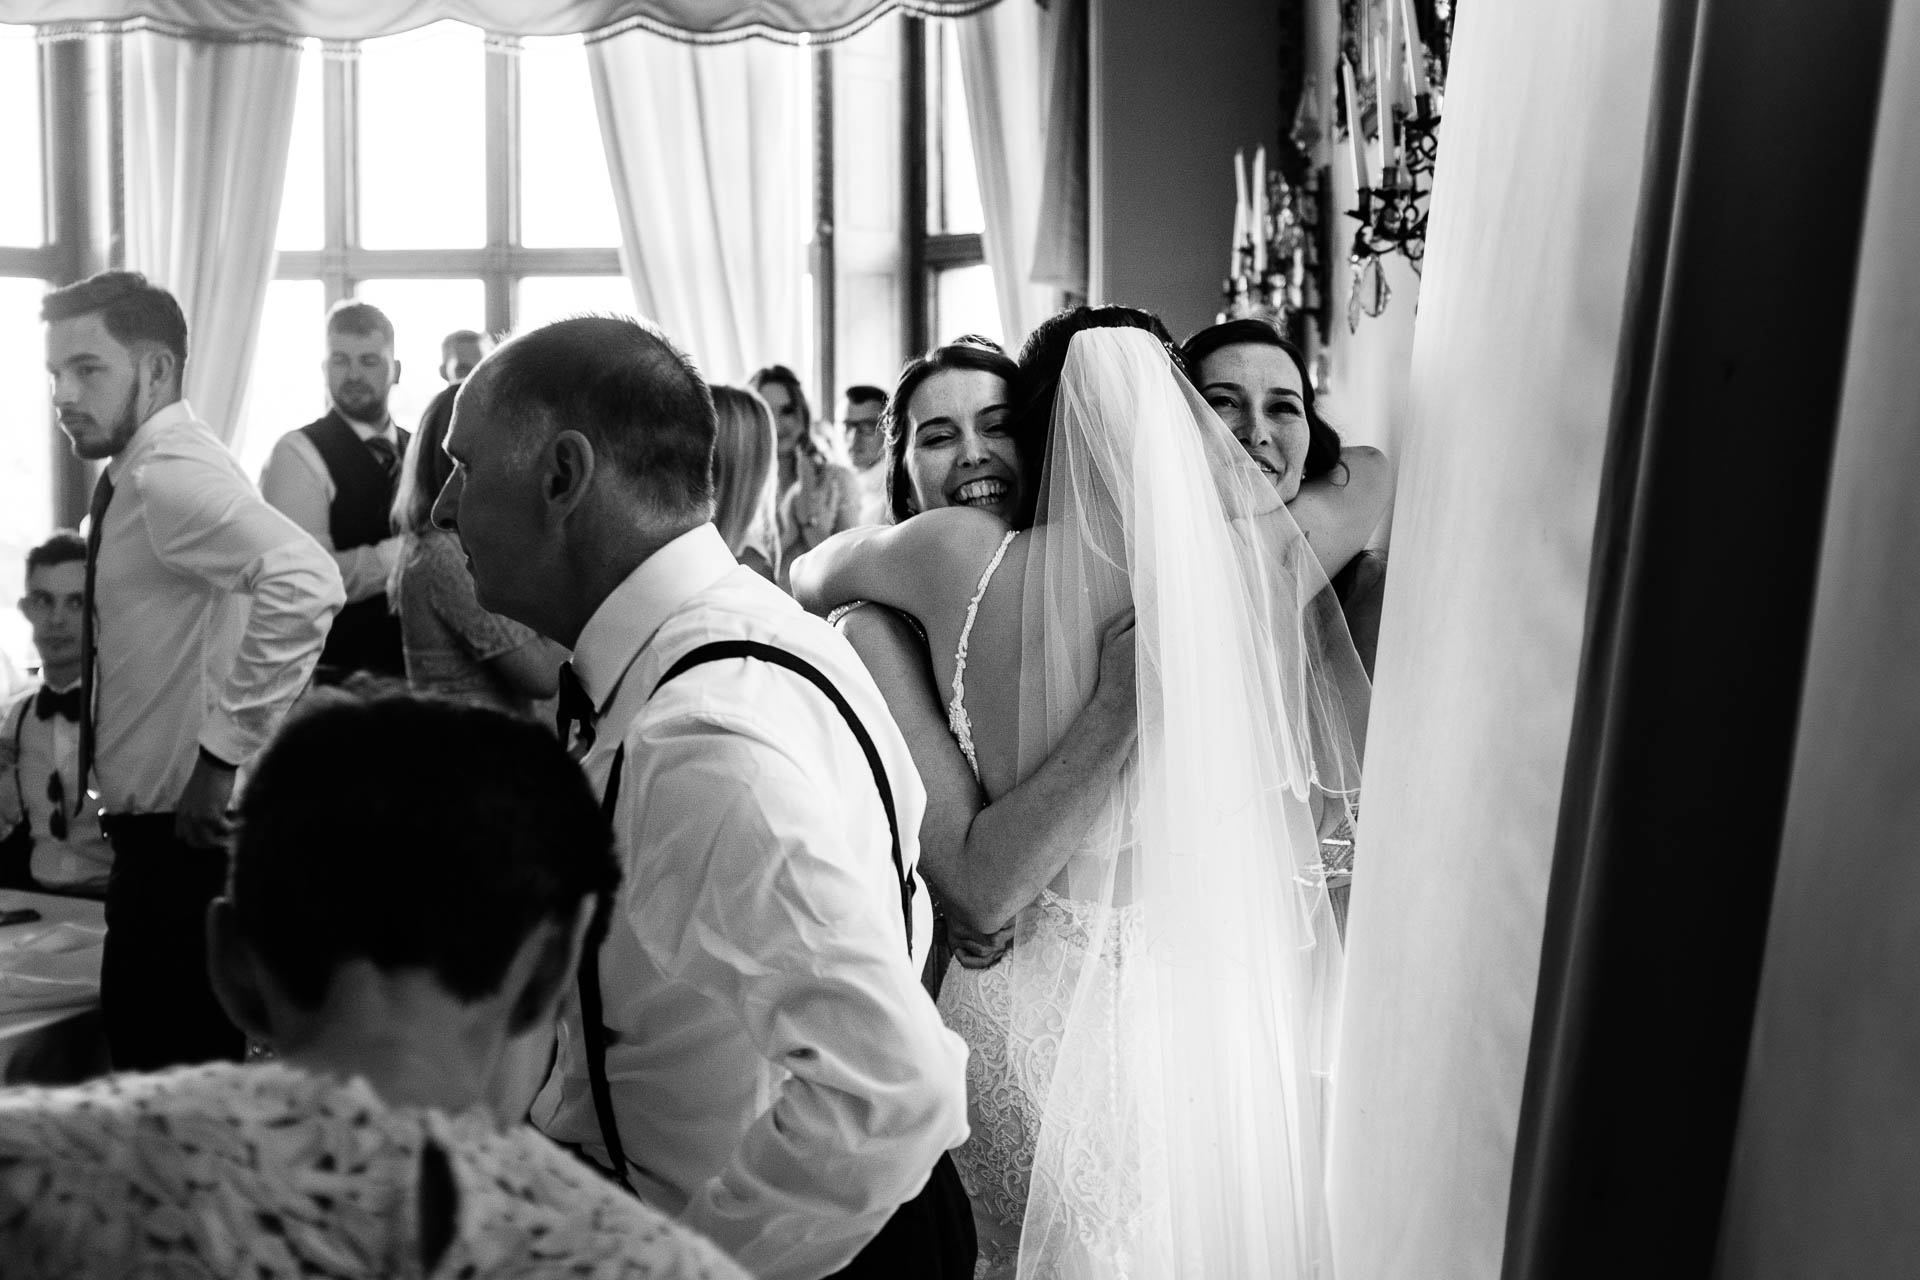 orchardleigh house wedding - Danni & Barney (395).jpg